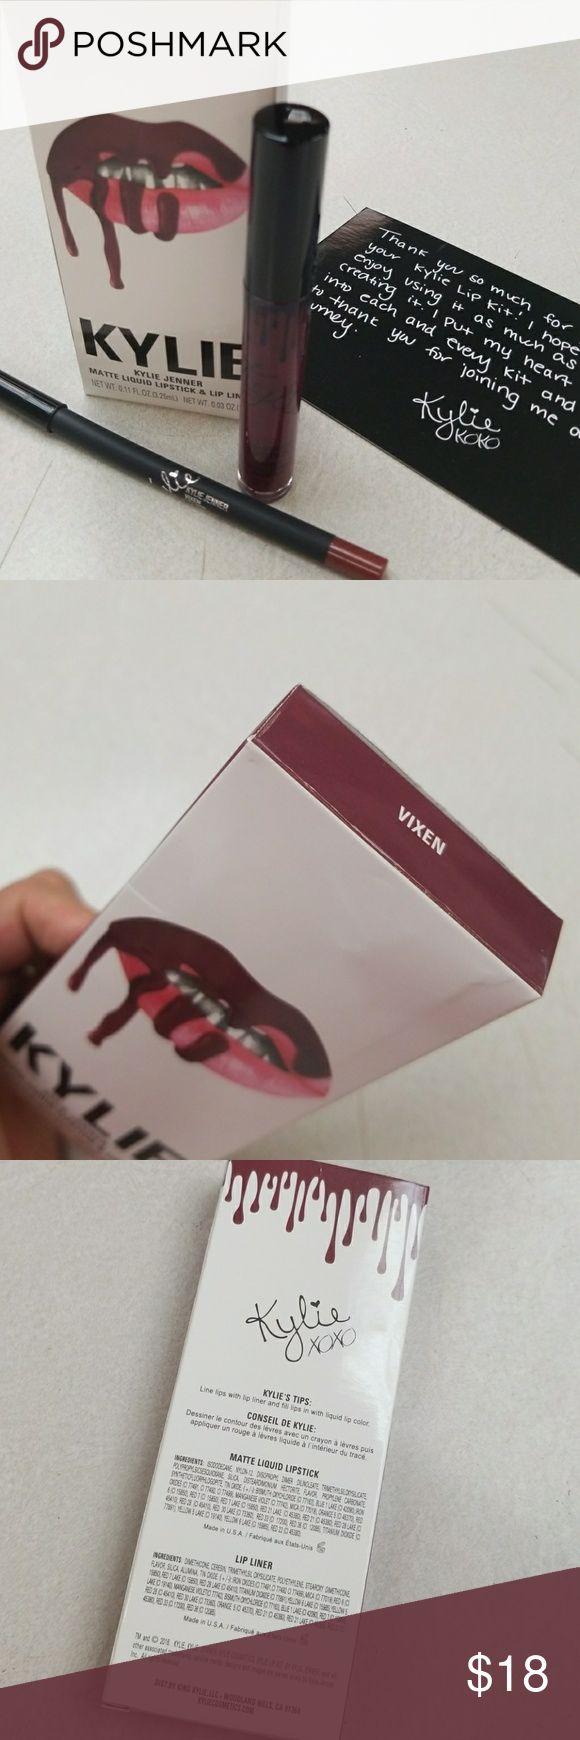 Vixen | Lip Kits Authentic Kylie Jenner matte liquid lipstick and lip liner kit. Color: Vixen (blackened vampy plum)  Kit contains: 1 matte liquid lipstick  1 pencil lip liner Kylie Cosmetics Makeup Lipstick